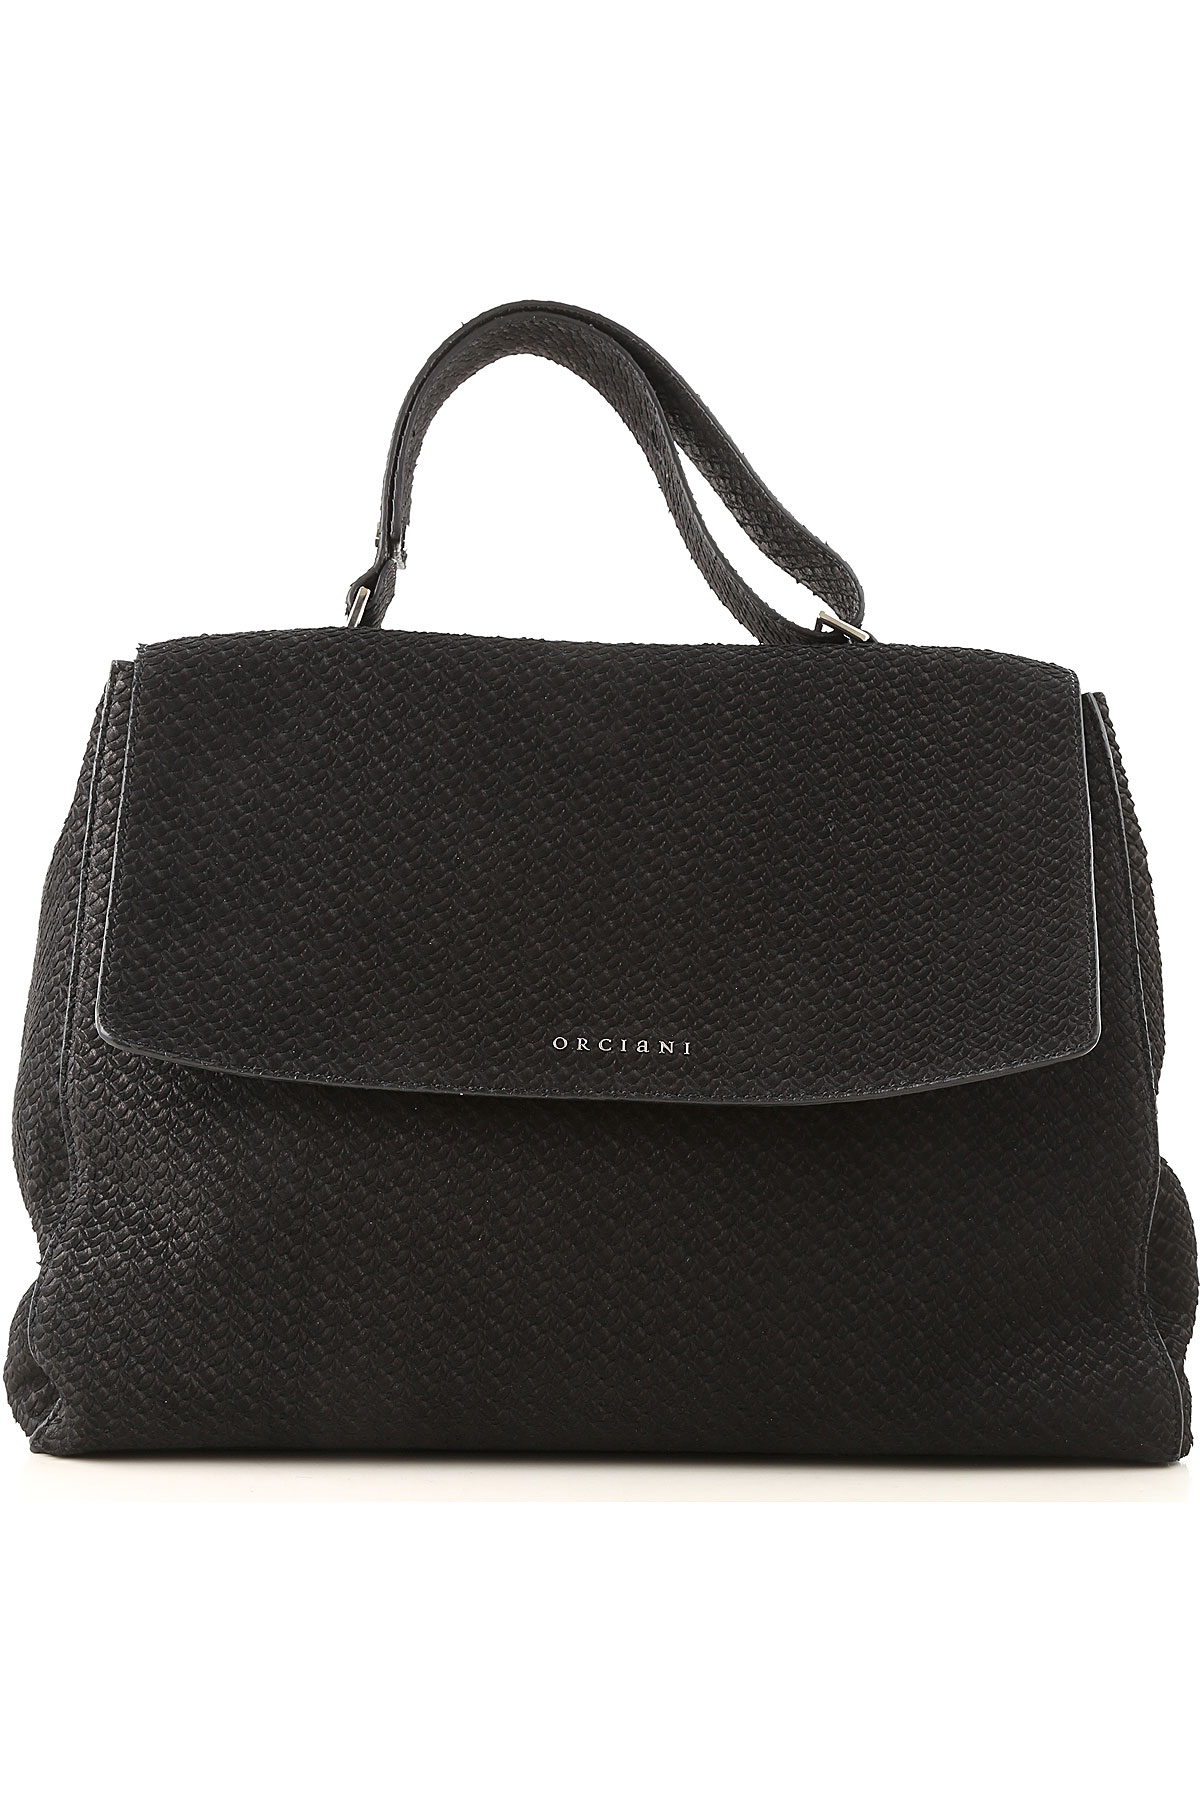 Image of Orciani Handbags, Black, suede, 2017